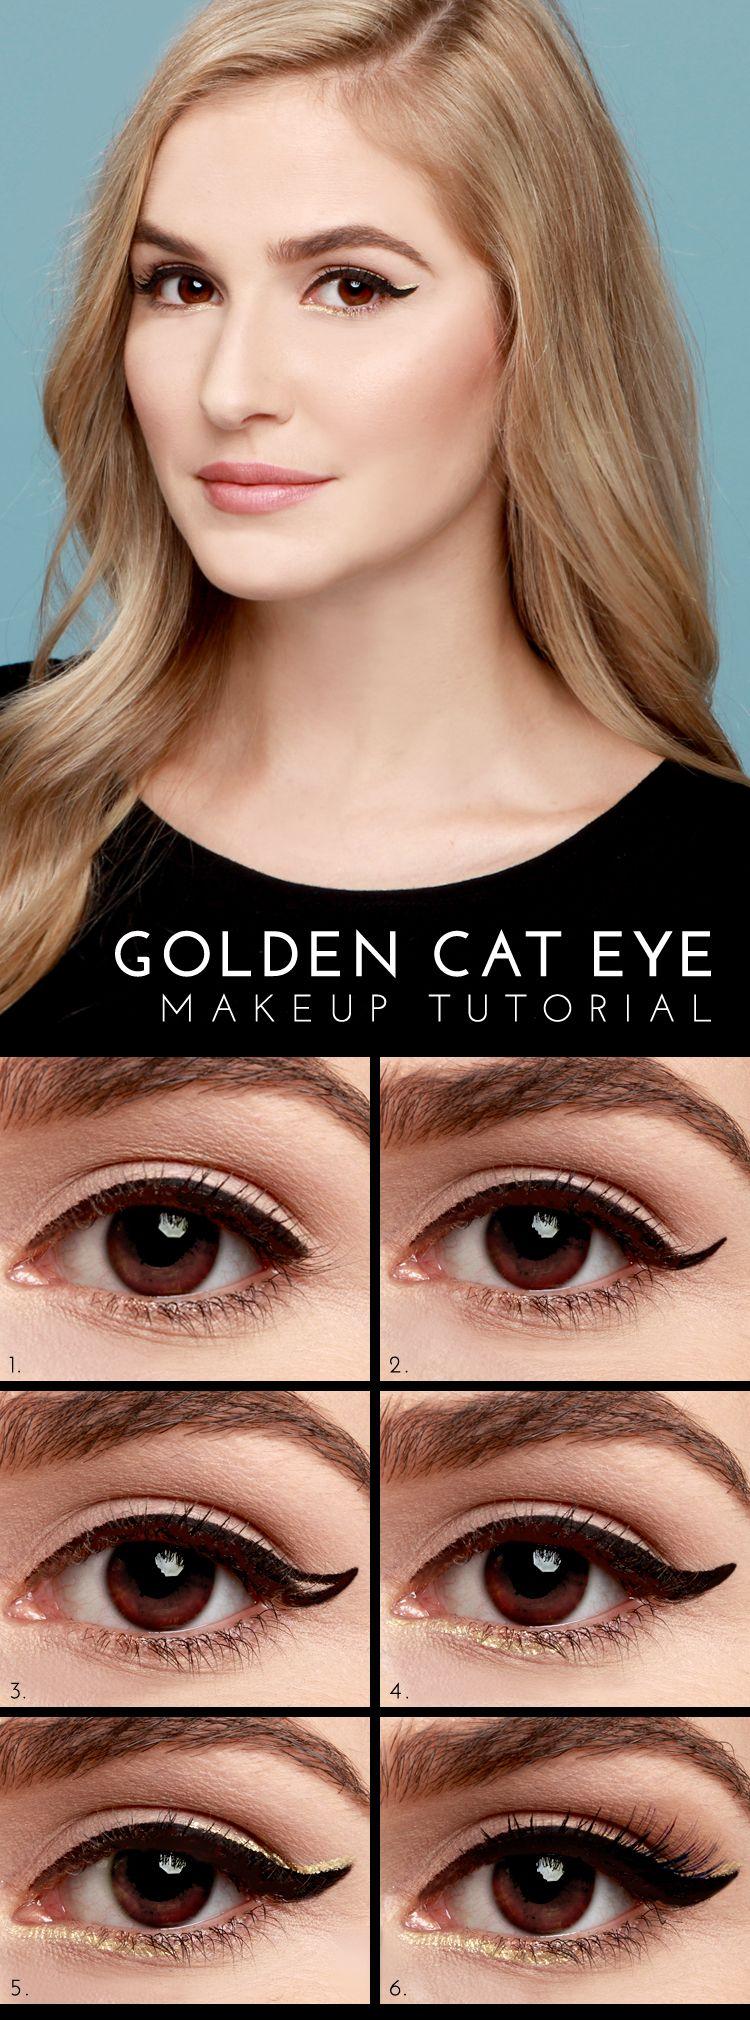 LuLu*s How-To: Golden Cat Eye Tutorial at LuLus.com!